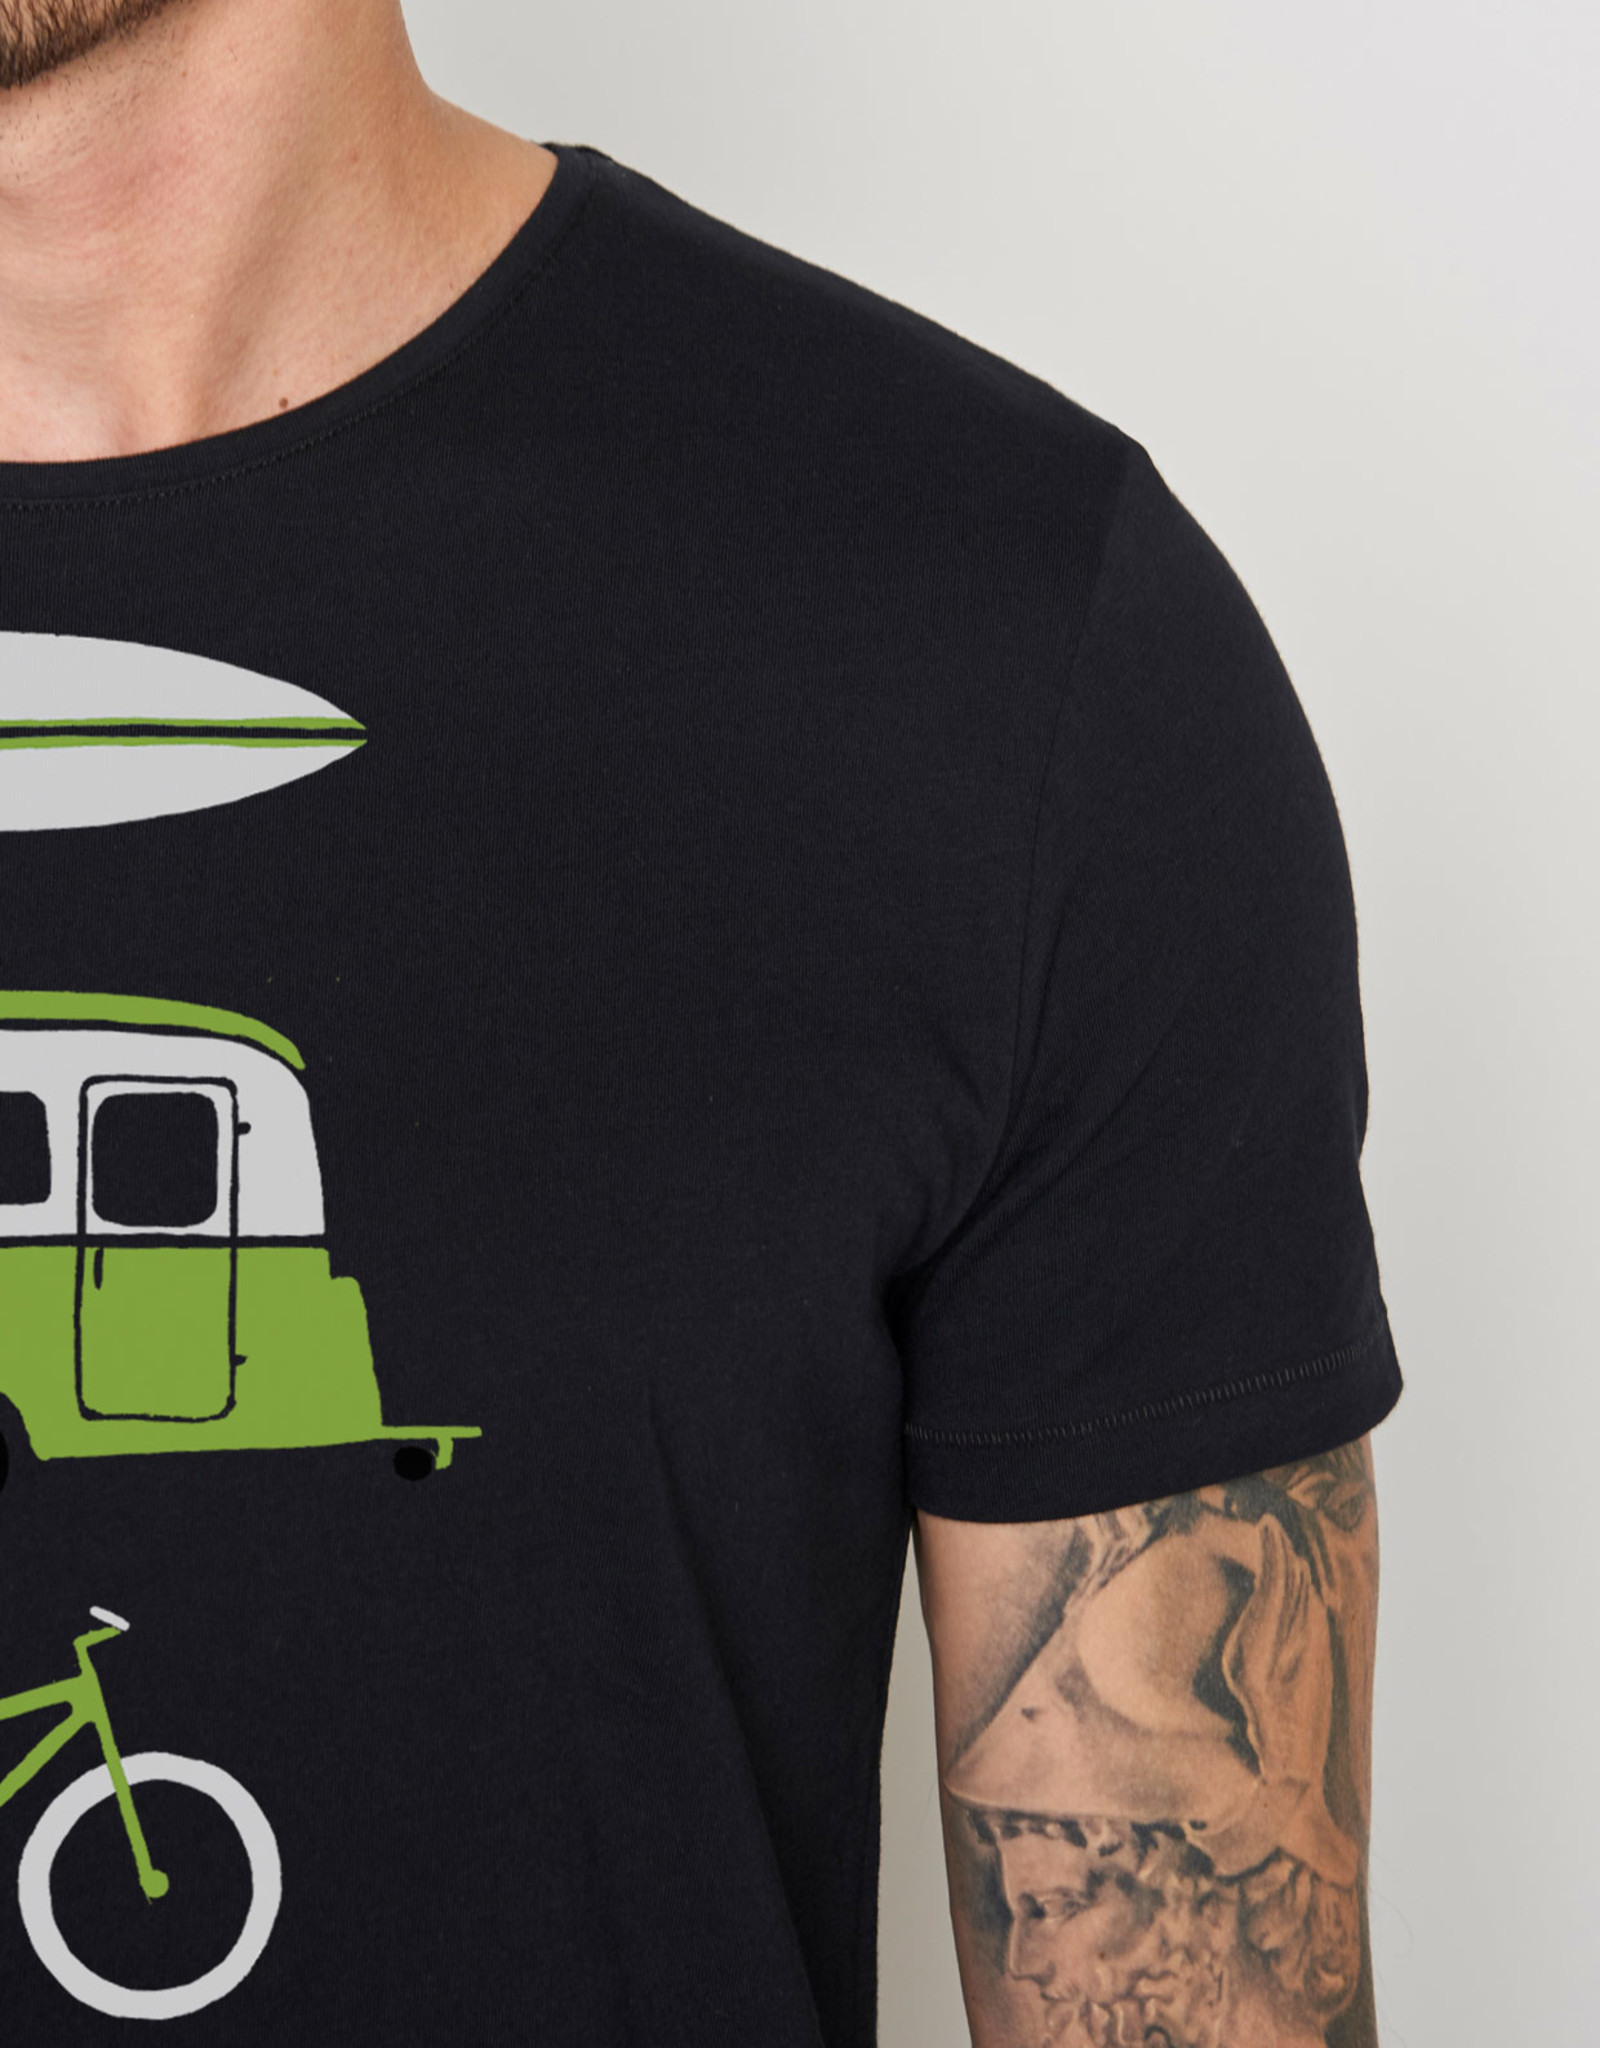 Greenbomb T-SHIRT ADVENTURE NATURE BLACK SPICE